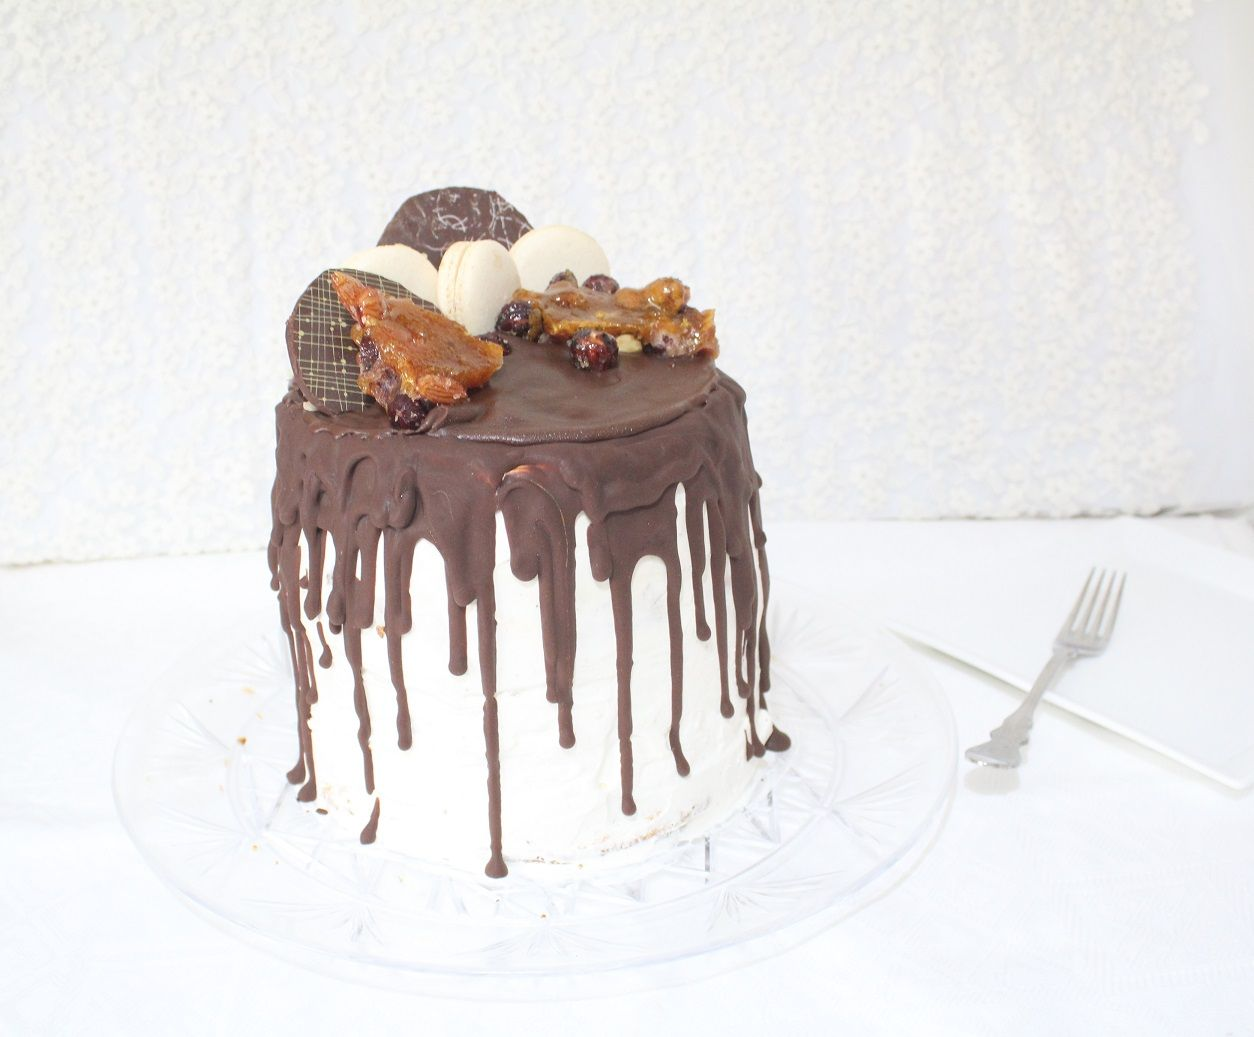 IMG 0895 - עוגת שכבות מיץ קציפת שקדים פרלינה ומוס שוקולד